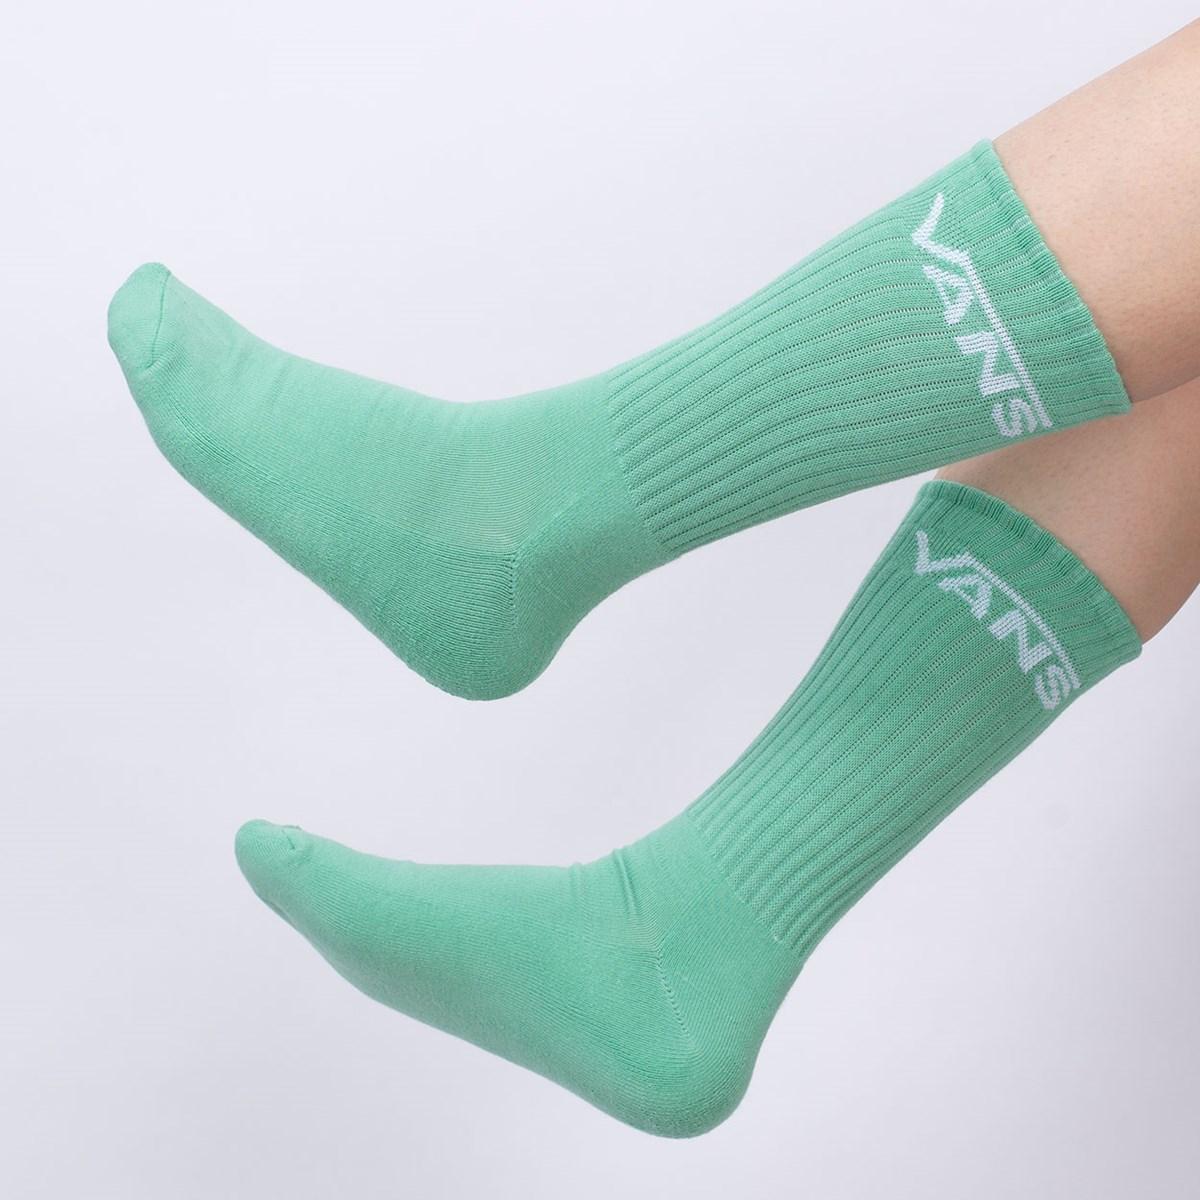 Meia Vans Classic Crew Kit 3 Pares Dusty Jade Green VN000XSEYKC